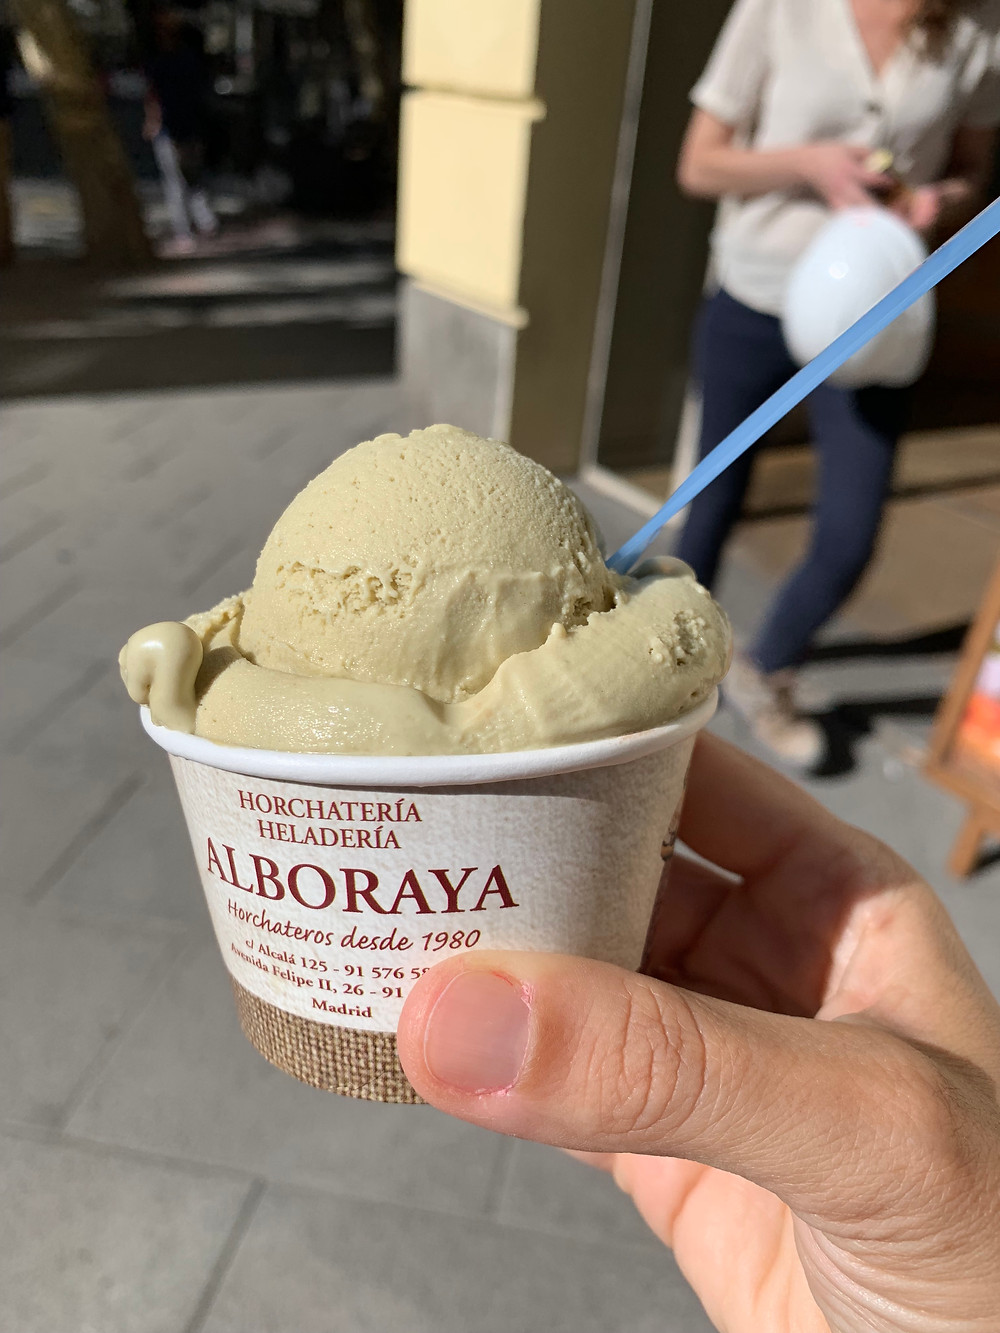 glace pistache Alboraya blog uneparisienneamadrid.com